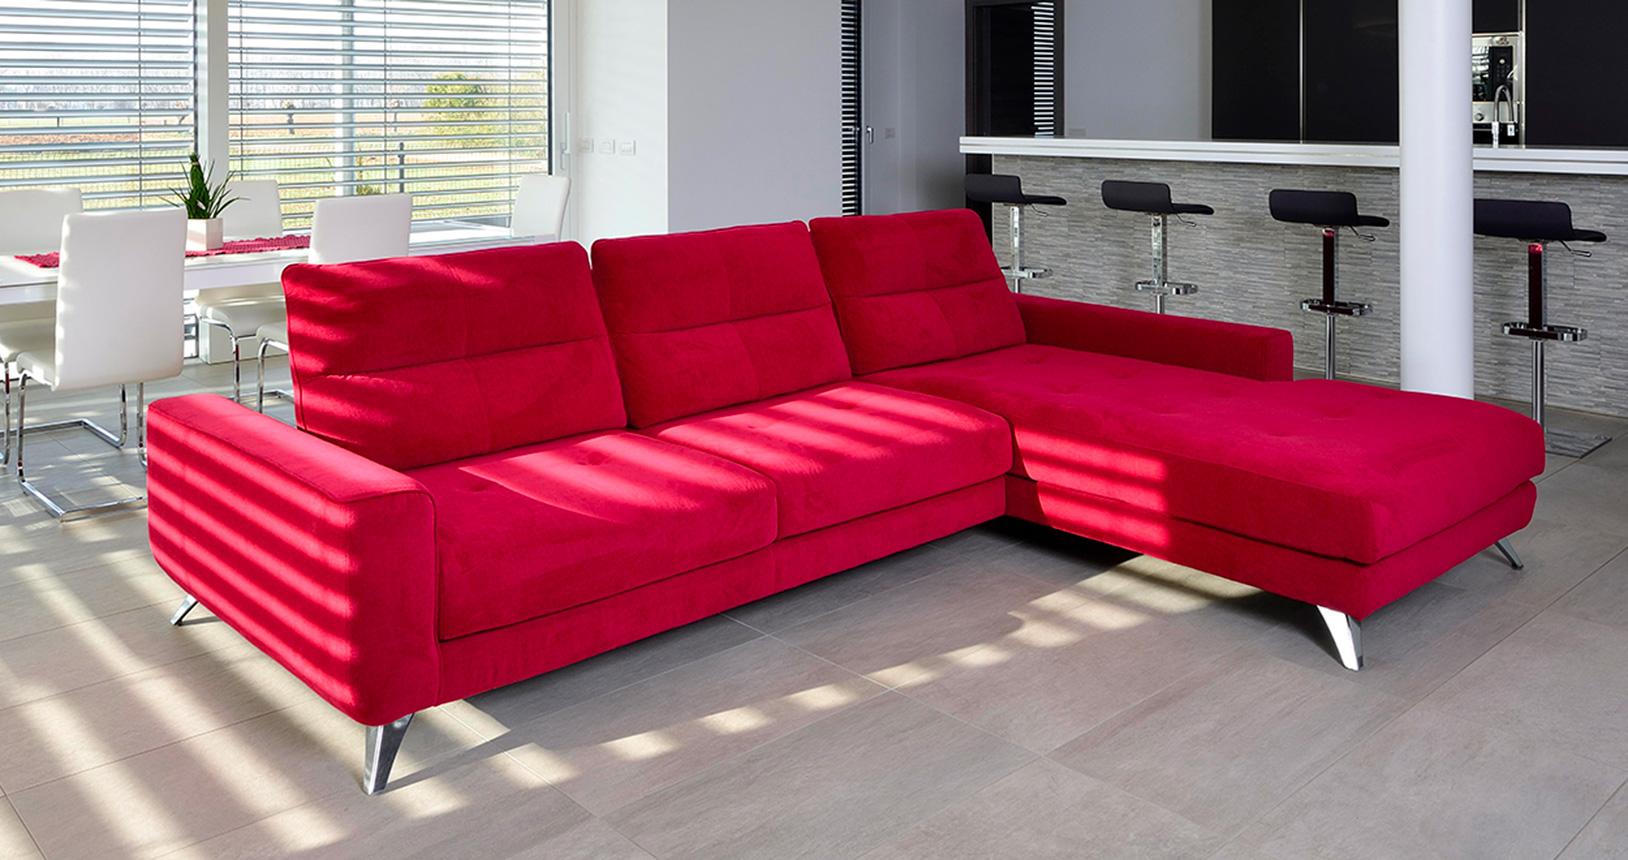 isabella-rosso-ambiente-penisola-divanileone